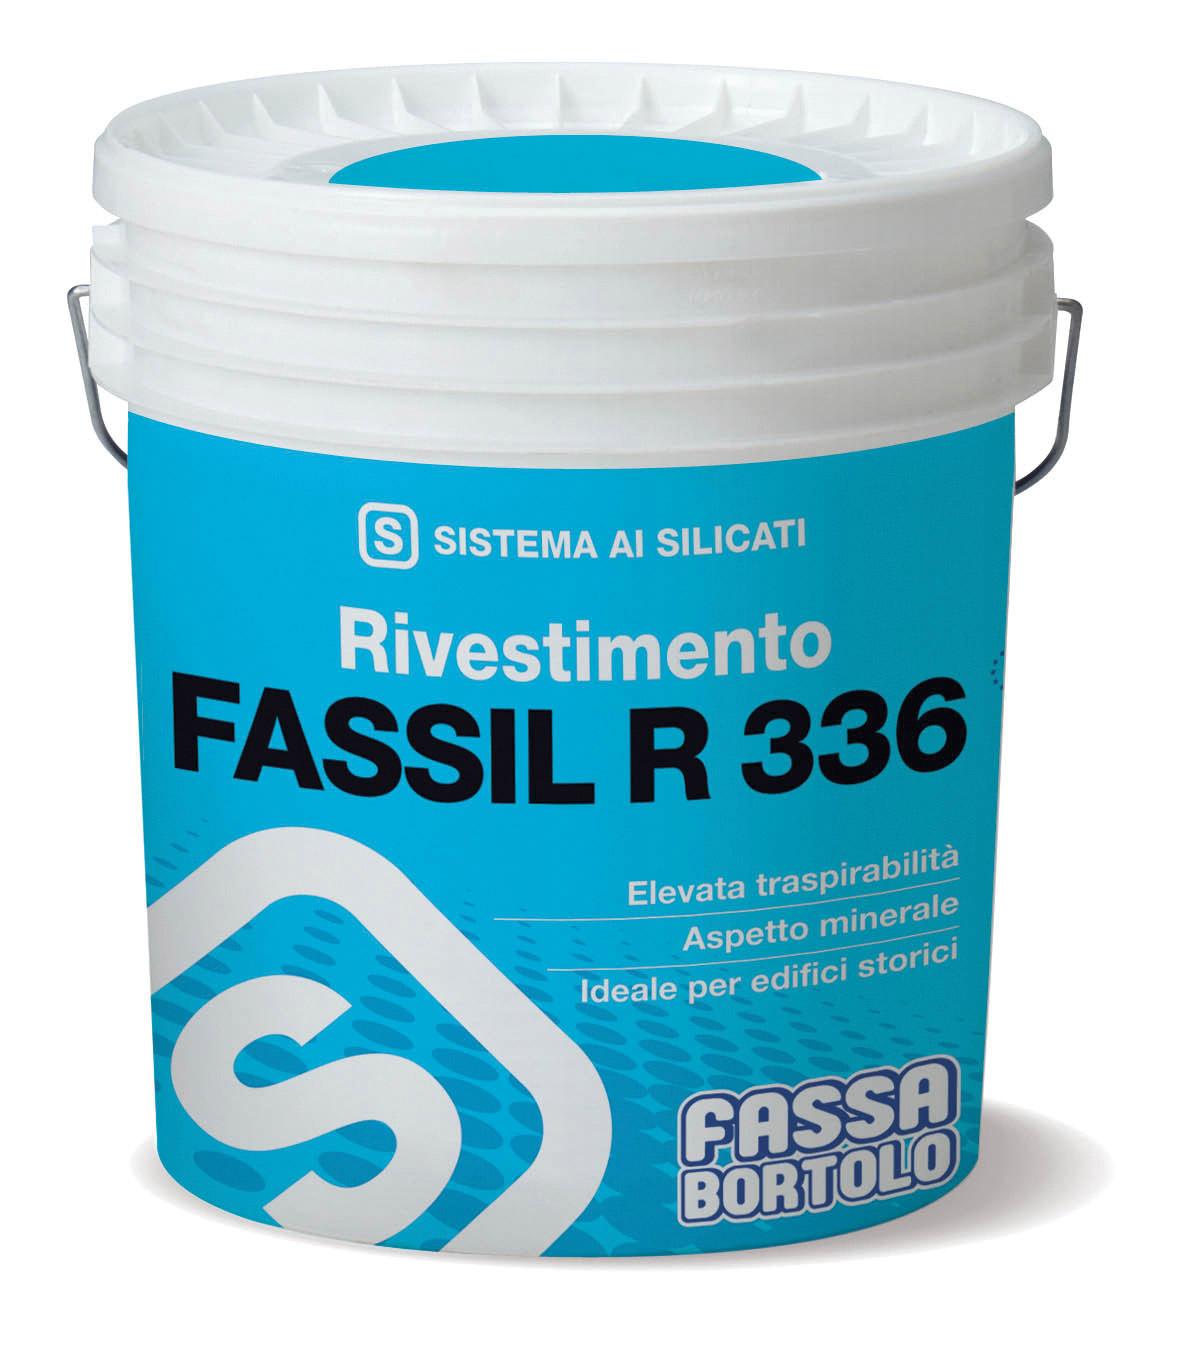 FASSIL R 336: Revestimento mineral à base de silicatos